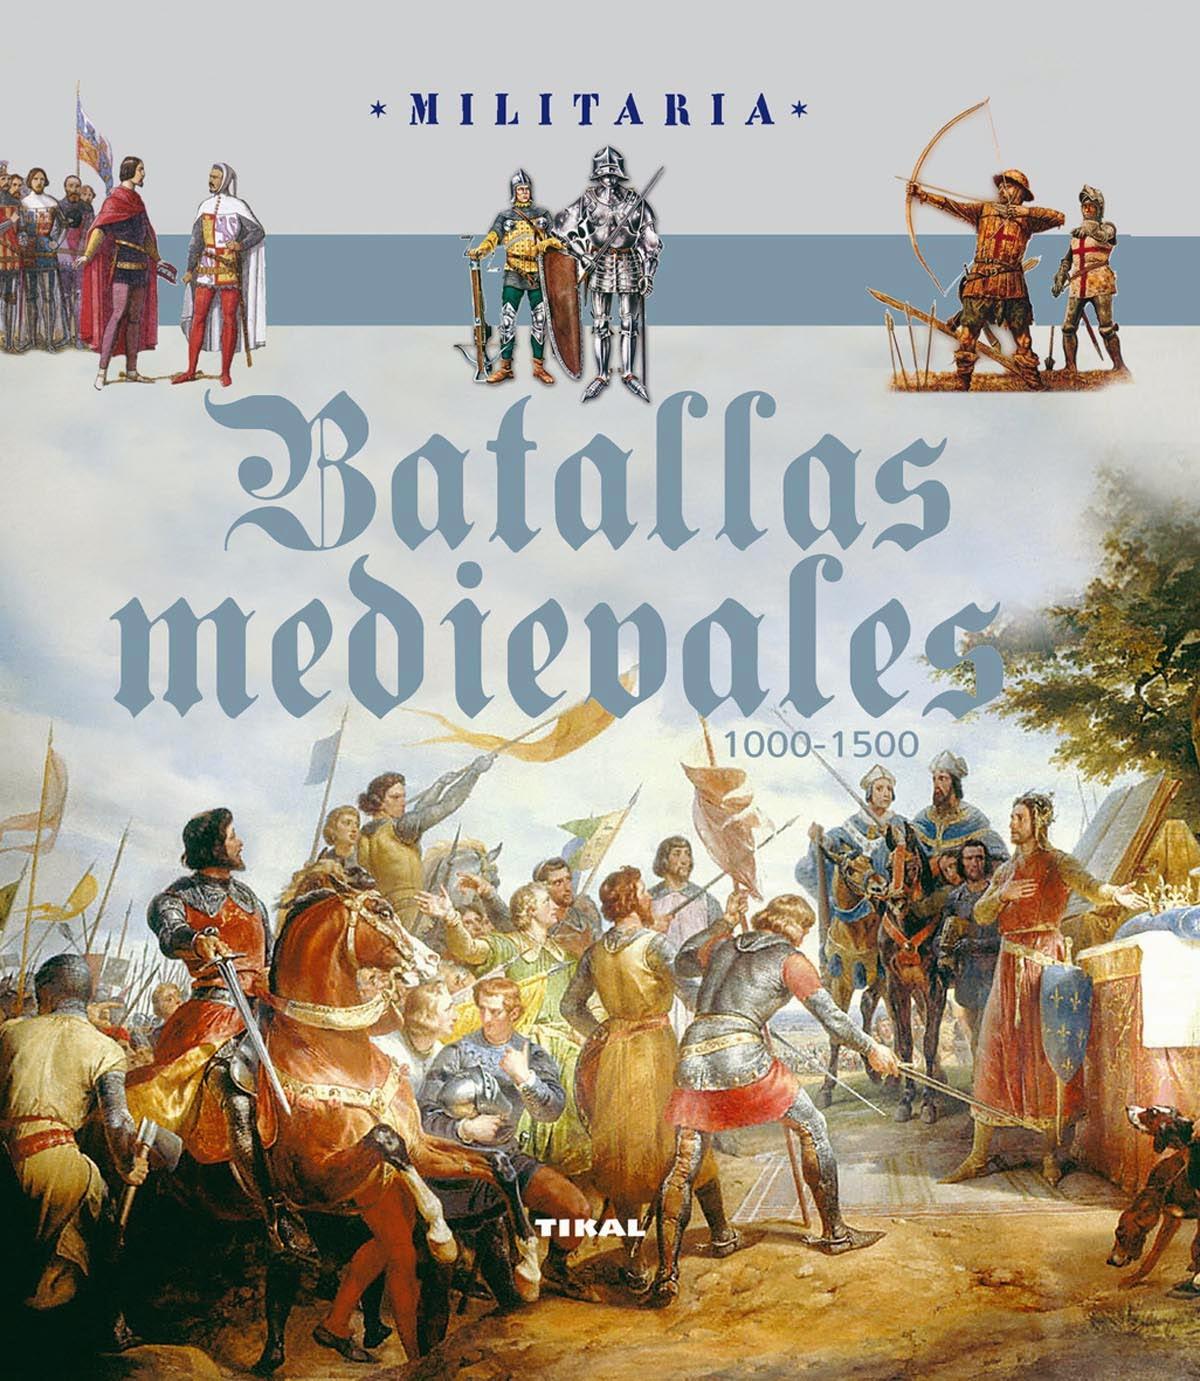 Batallas medievales TIKAL